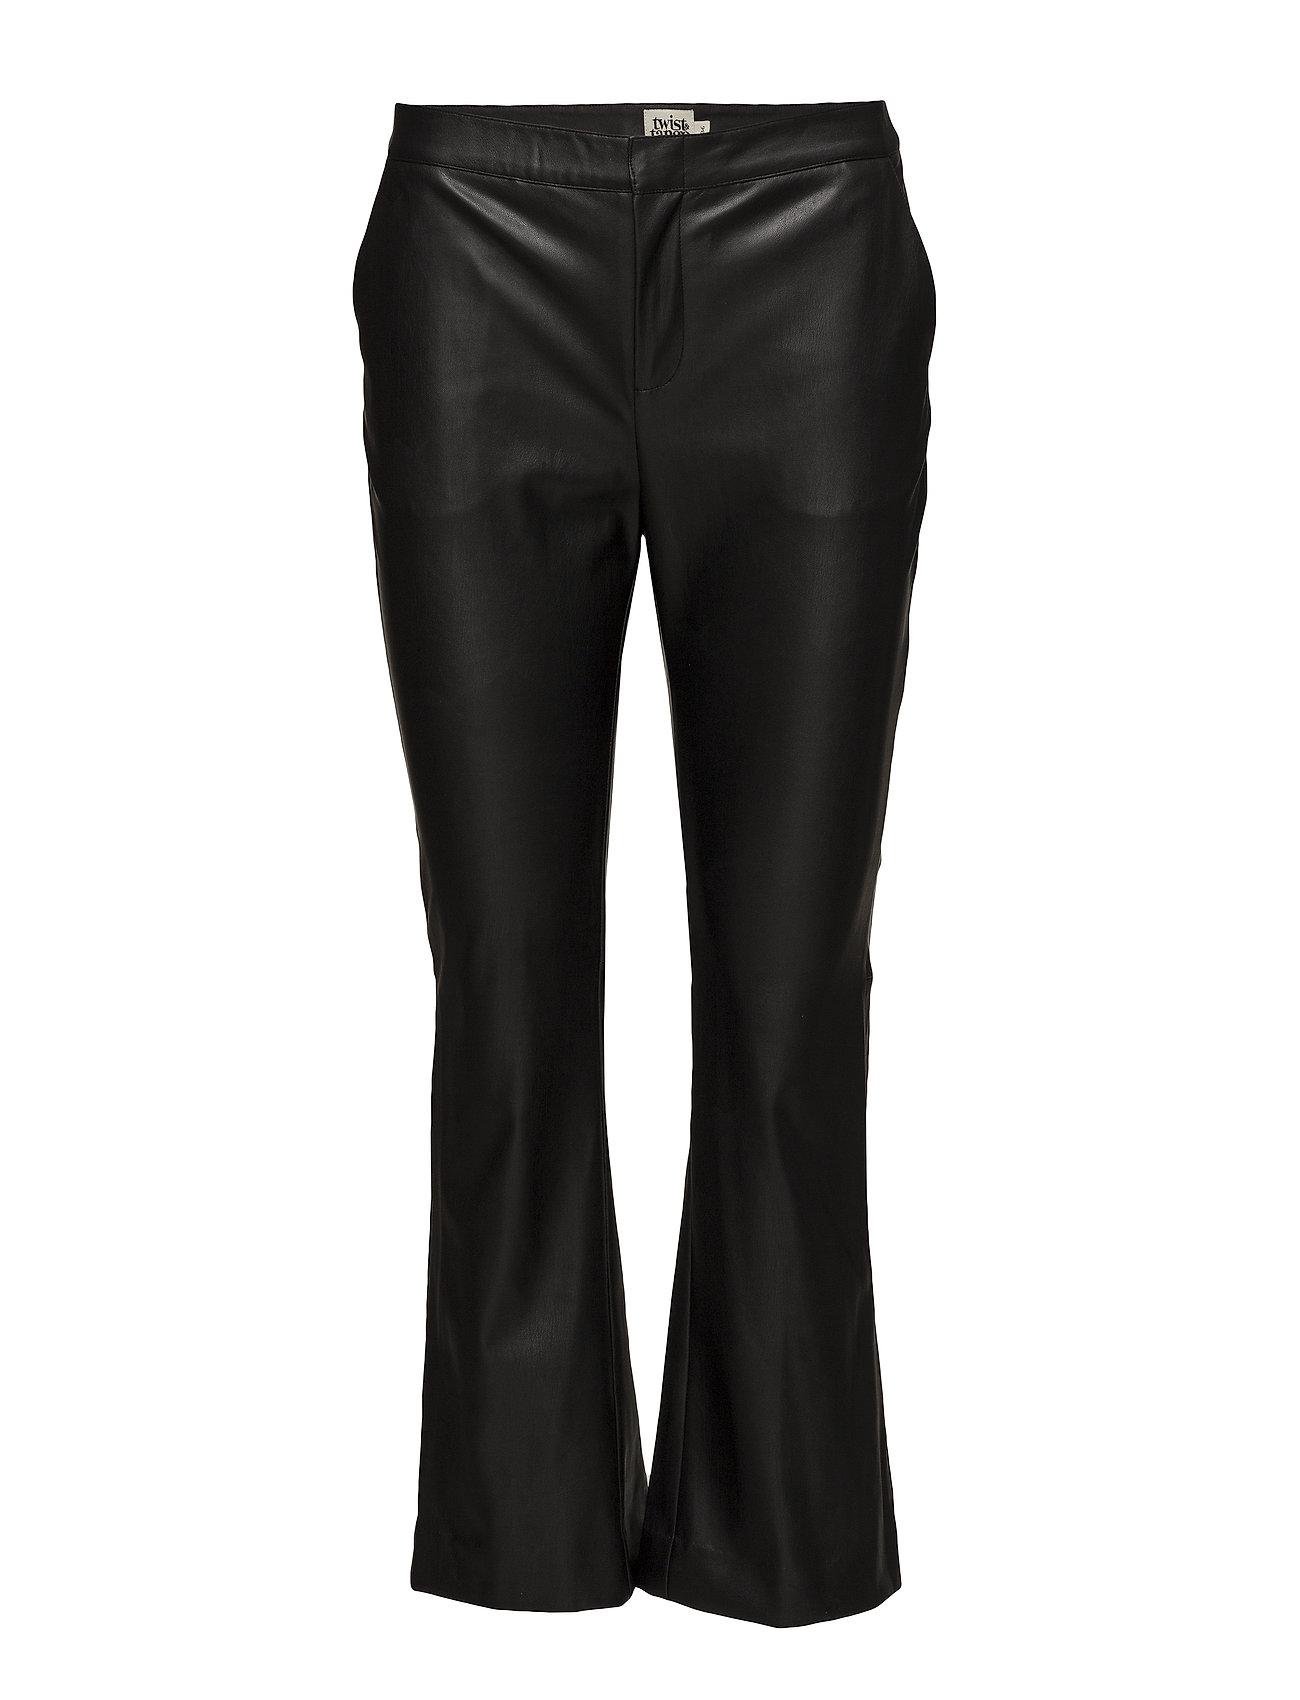 Twist & Tango Cornelia Trousers - BLACK